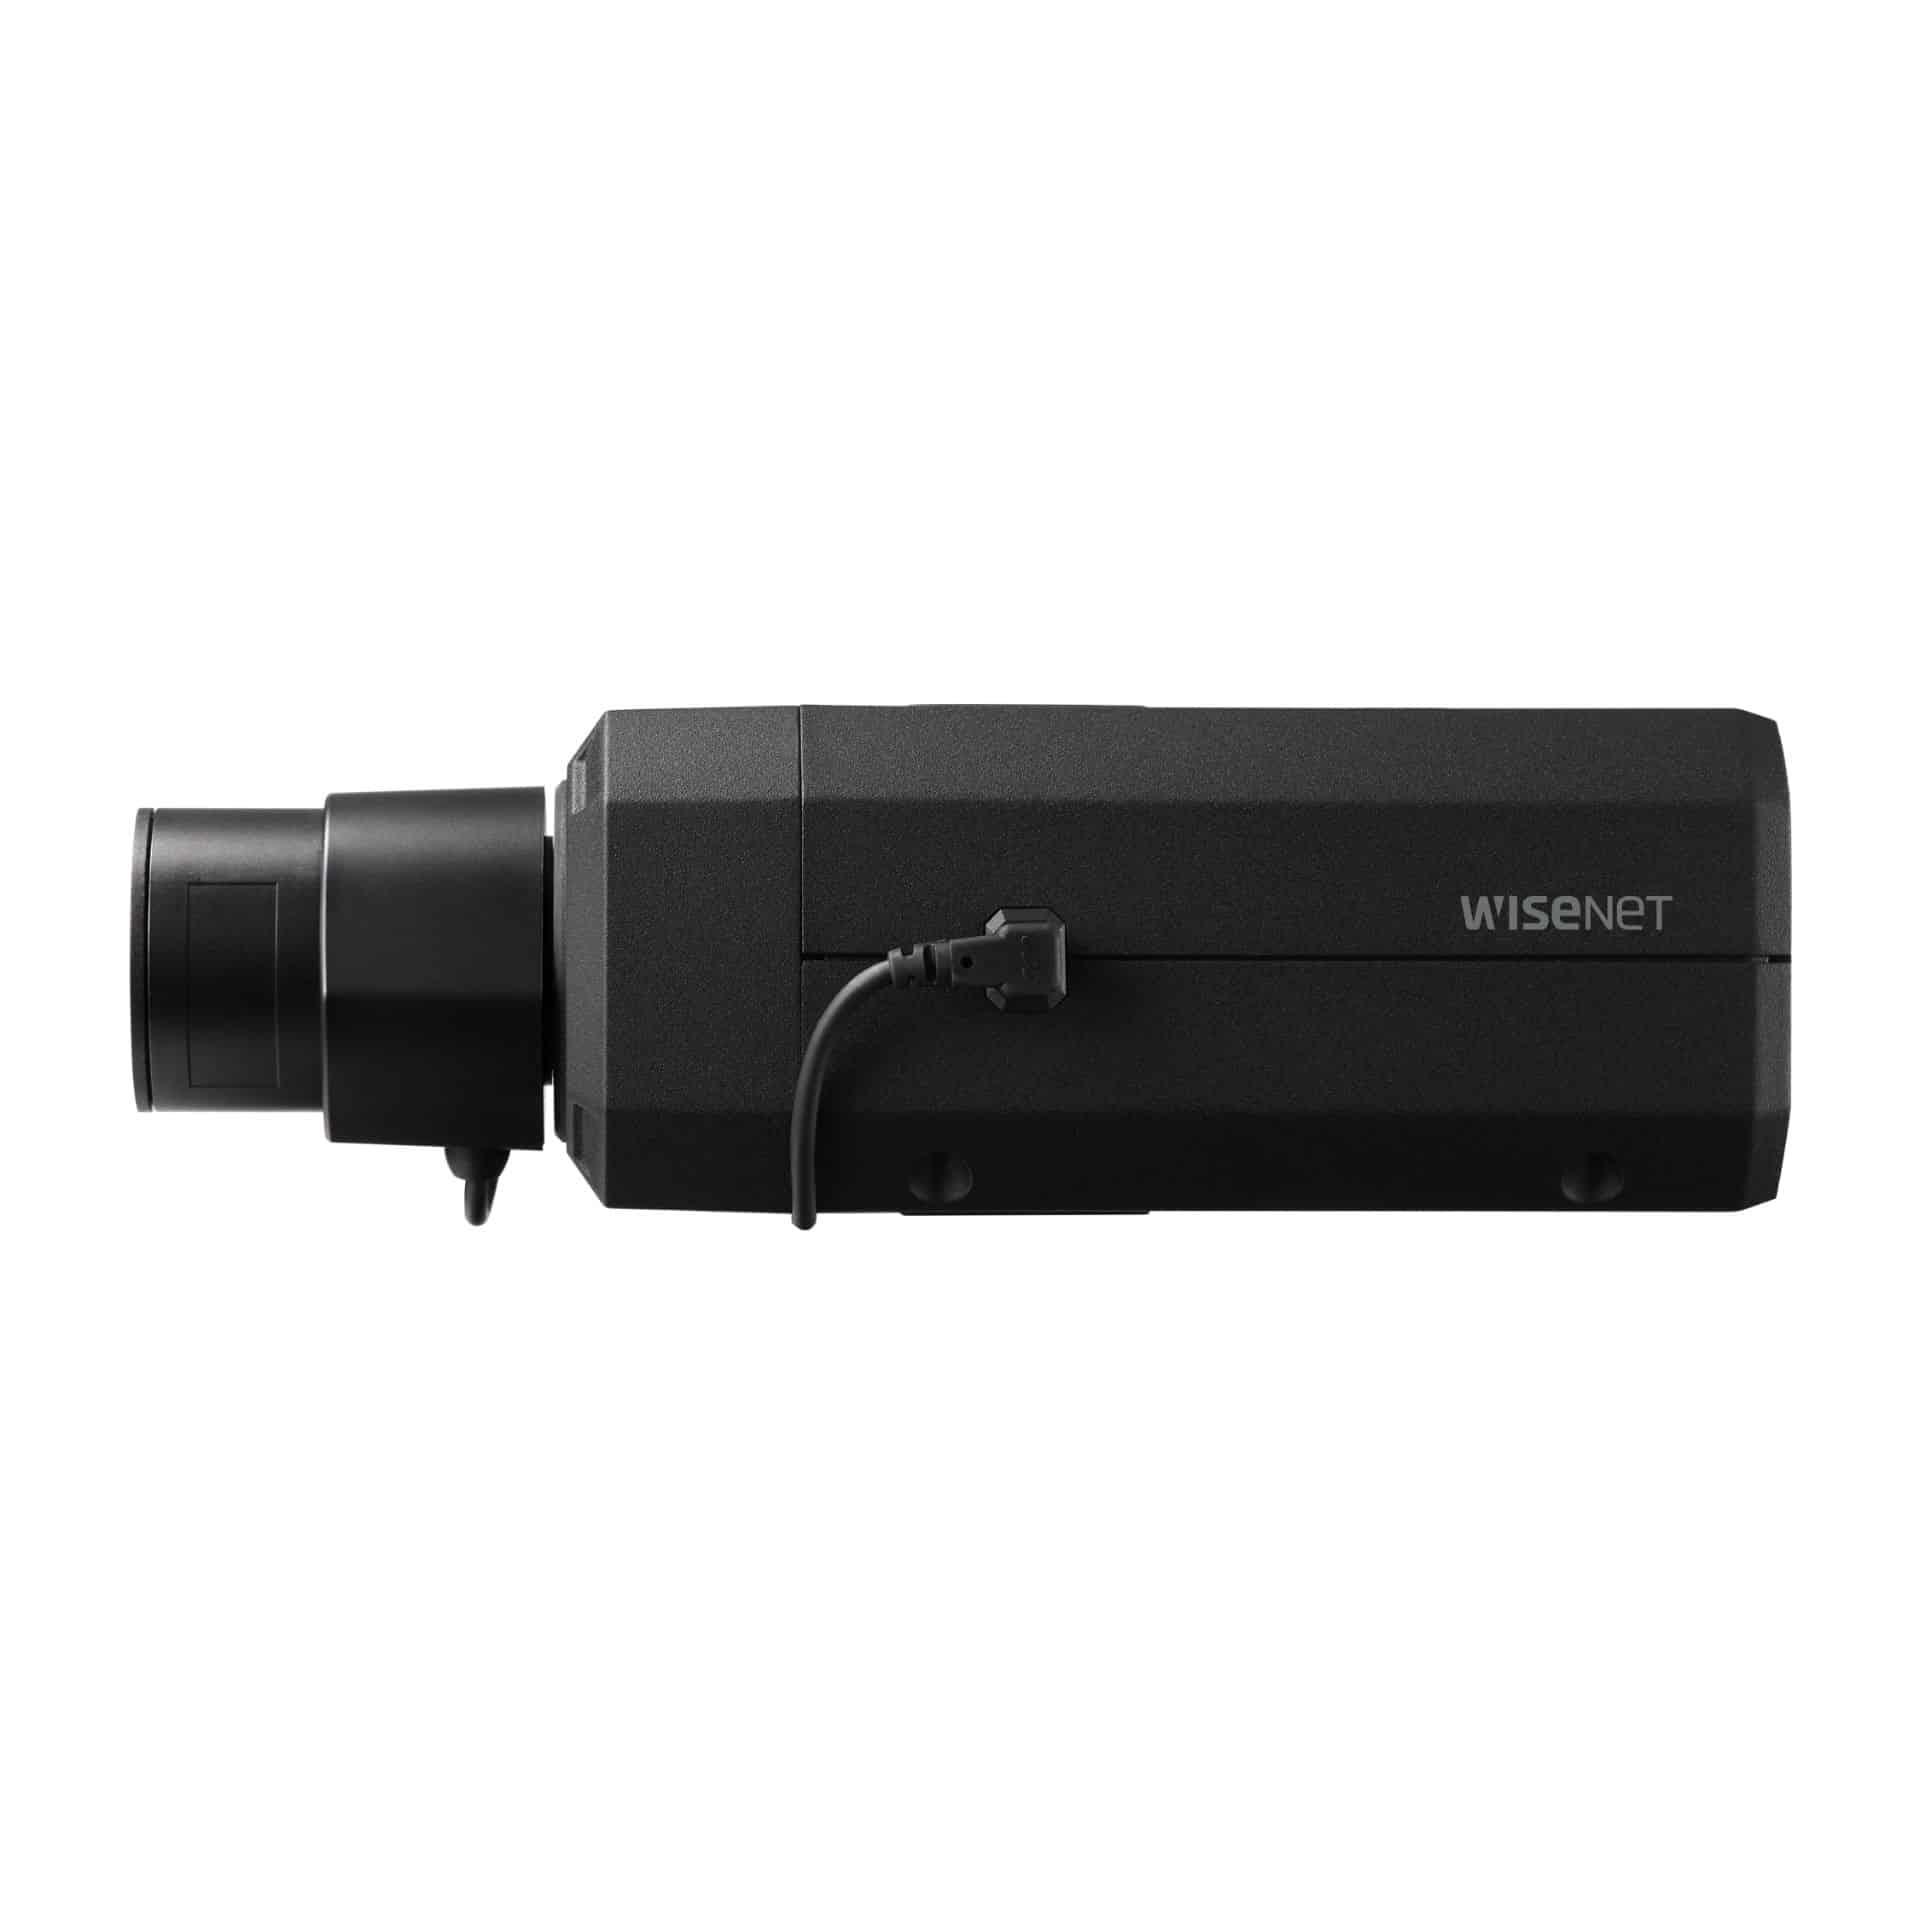 PNB-A9001 4K AI Box Camera